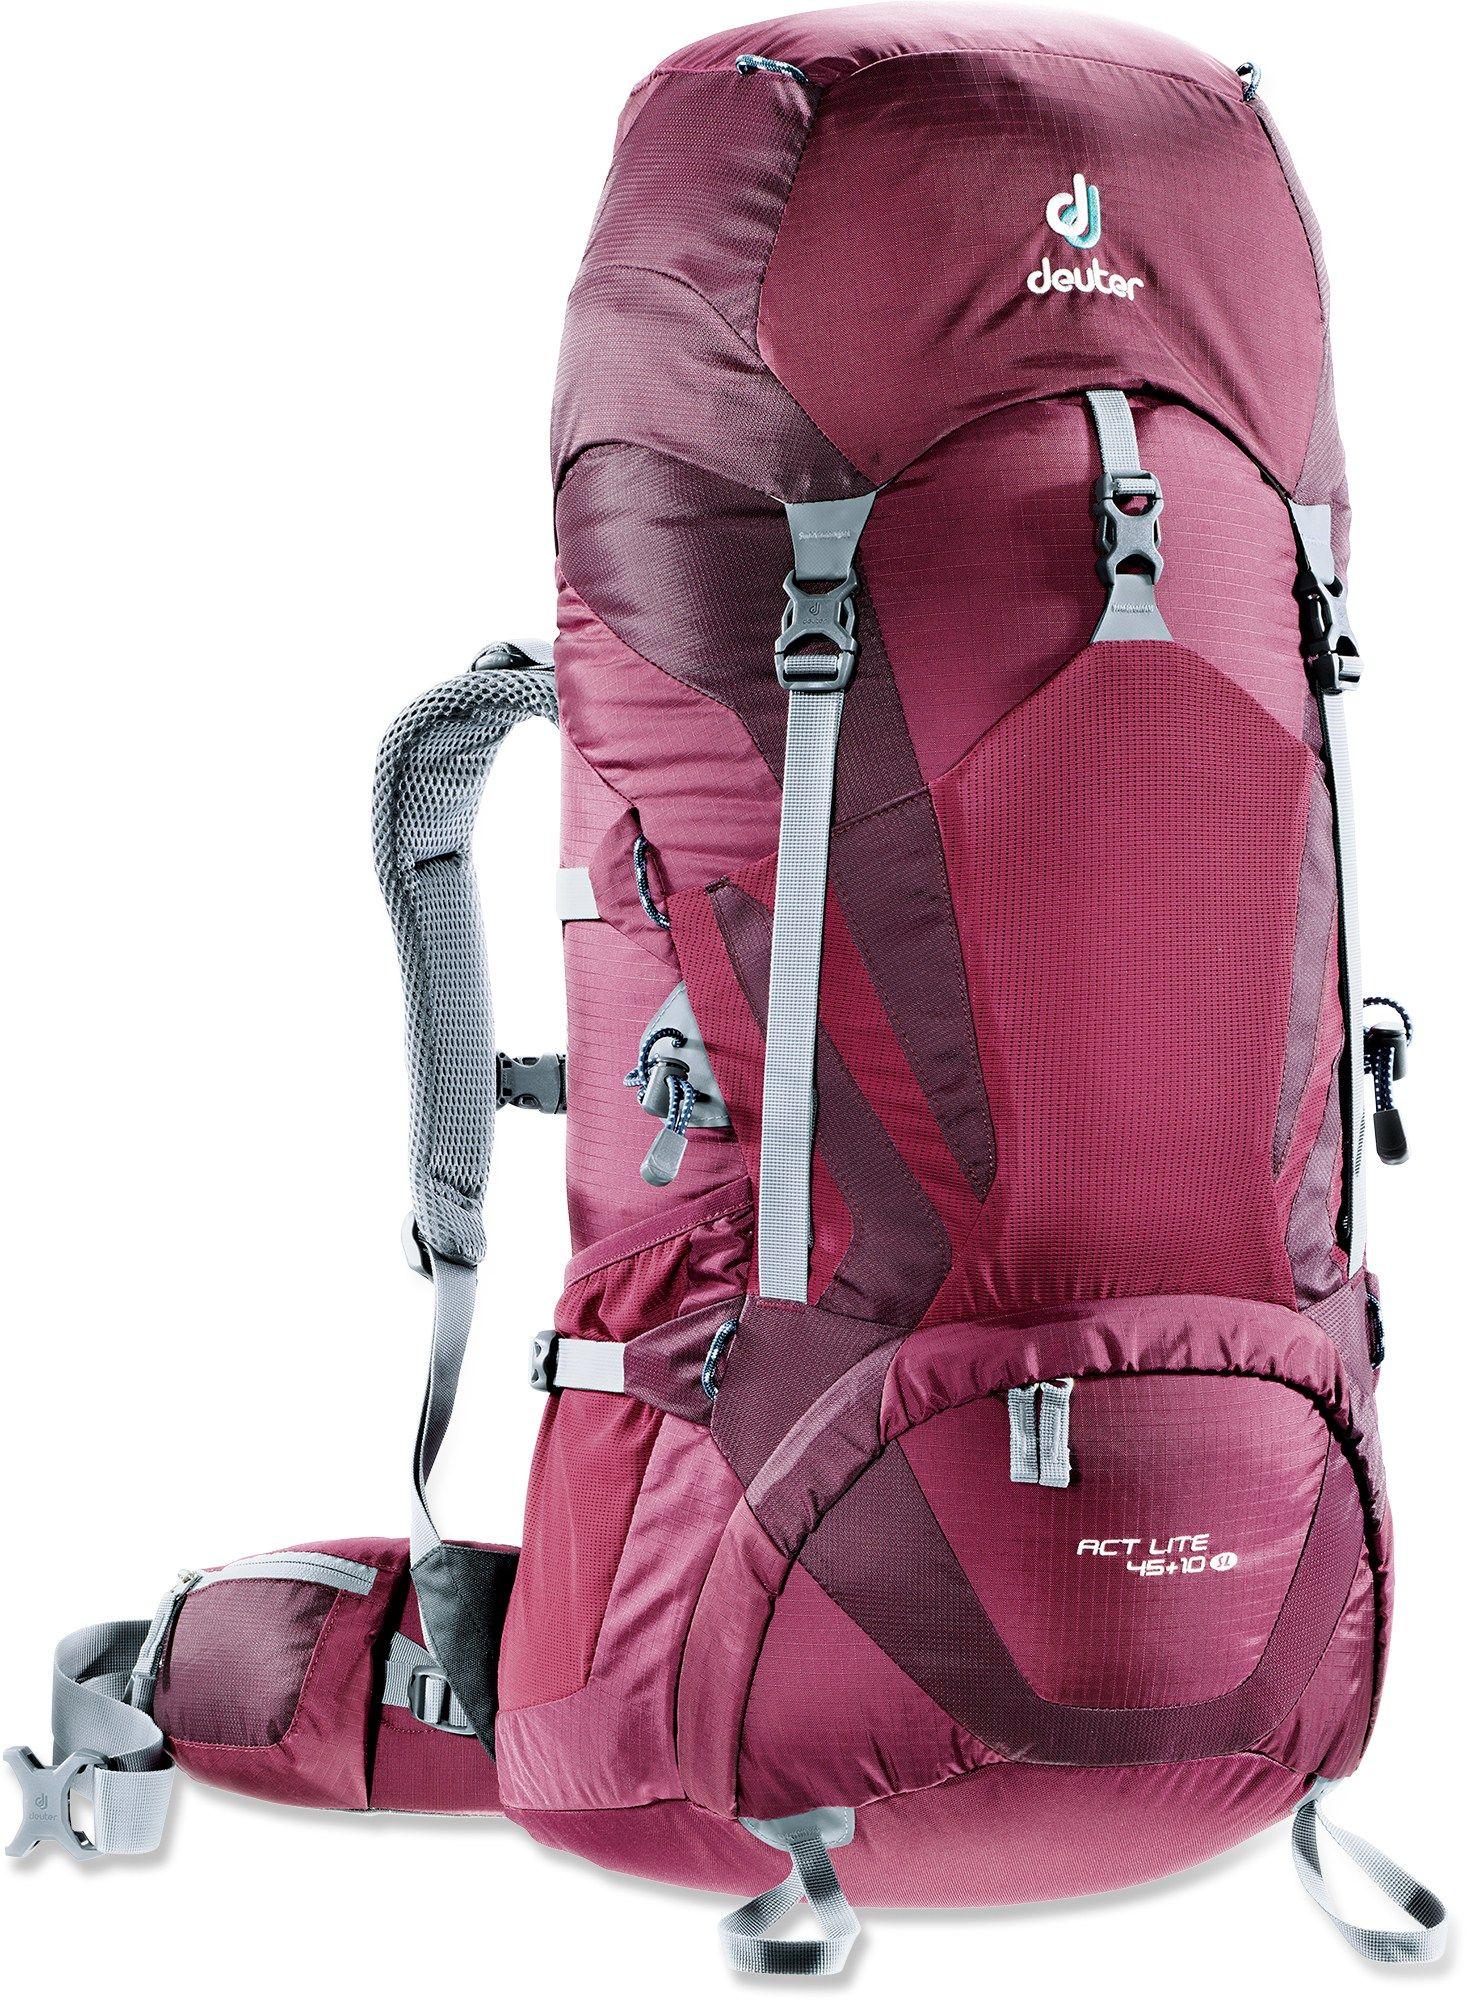 1000 ideas about deuter on pinterest backpacking. Black Bedroom Furniture Sets. Home Design Ideas